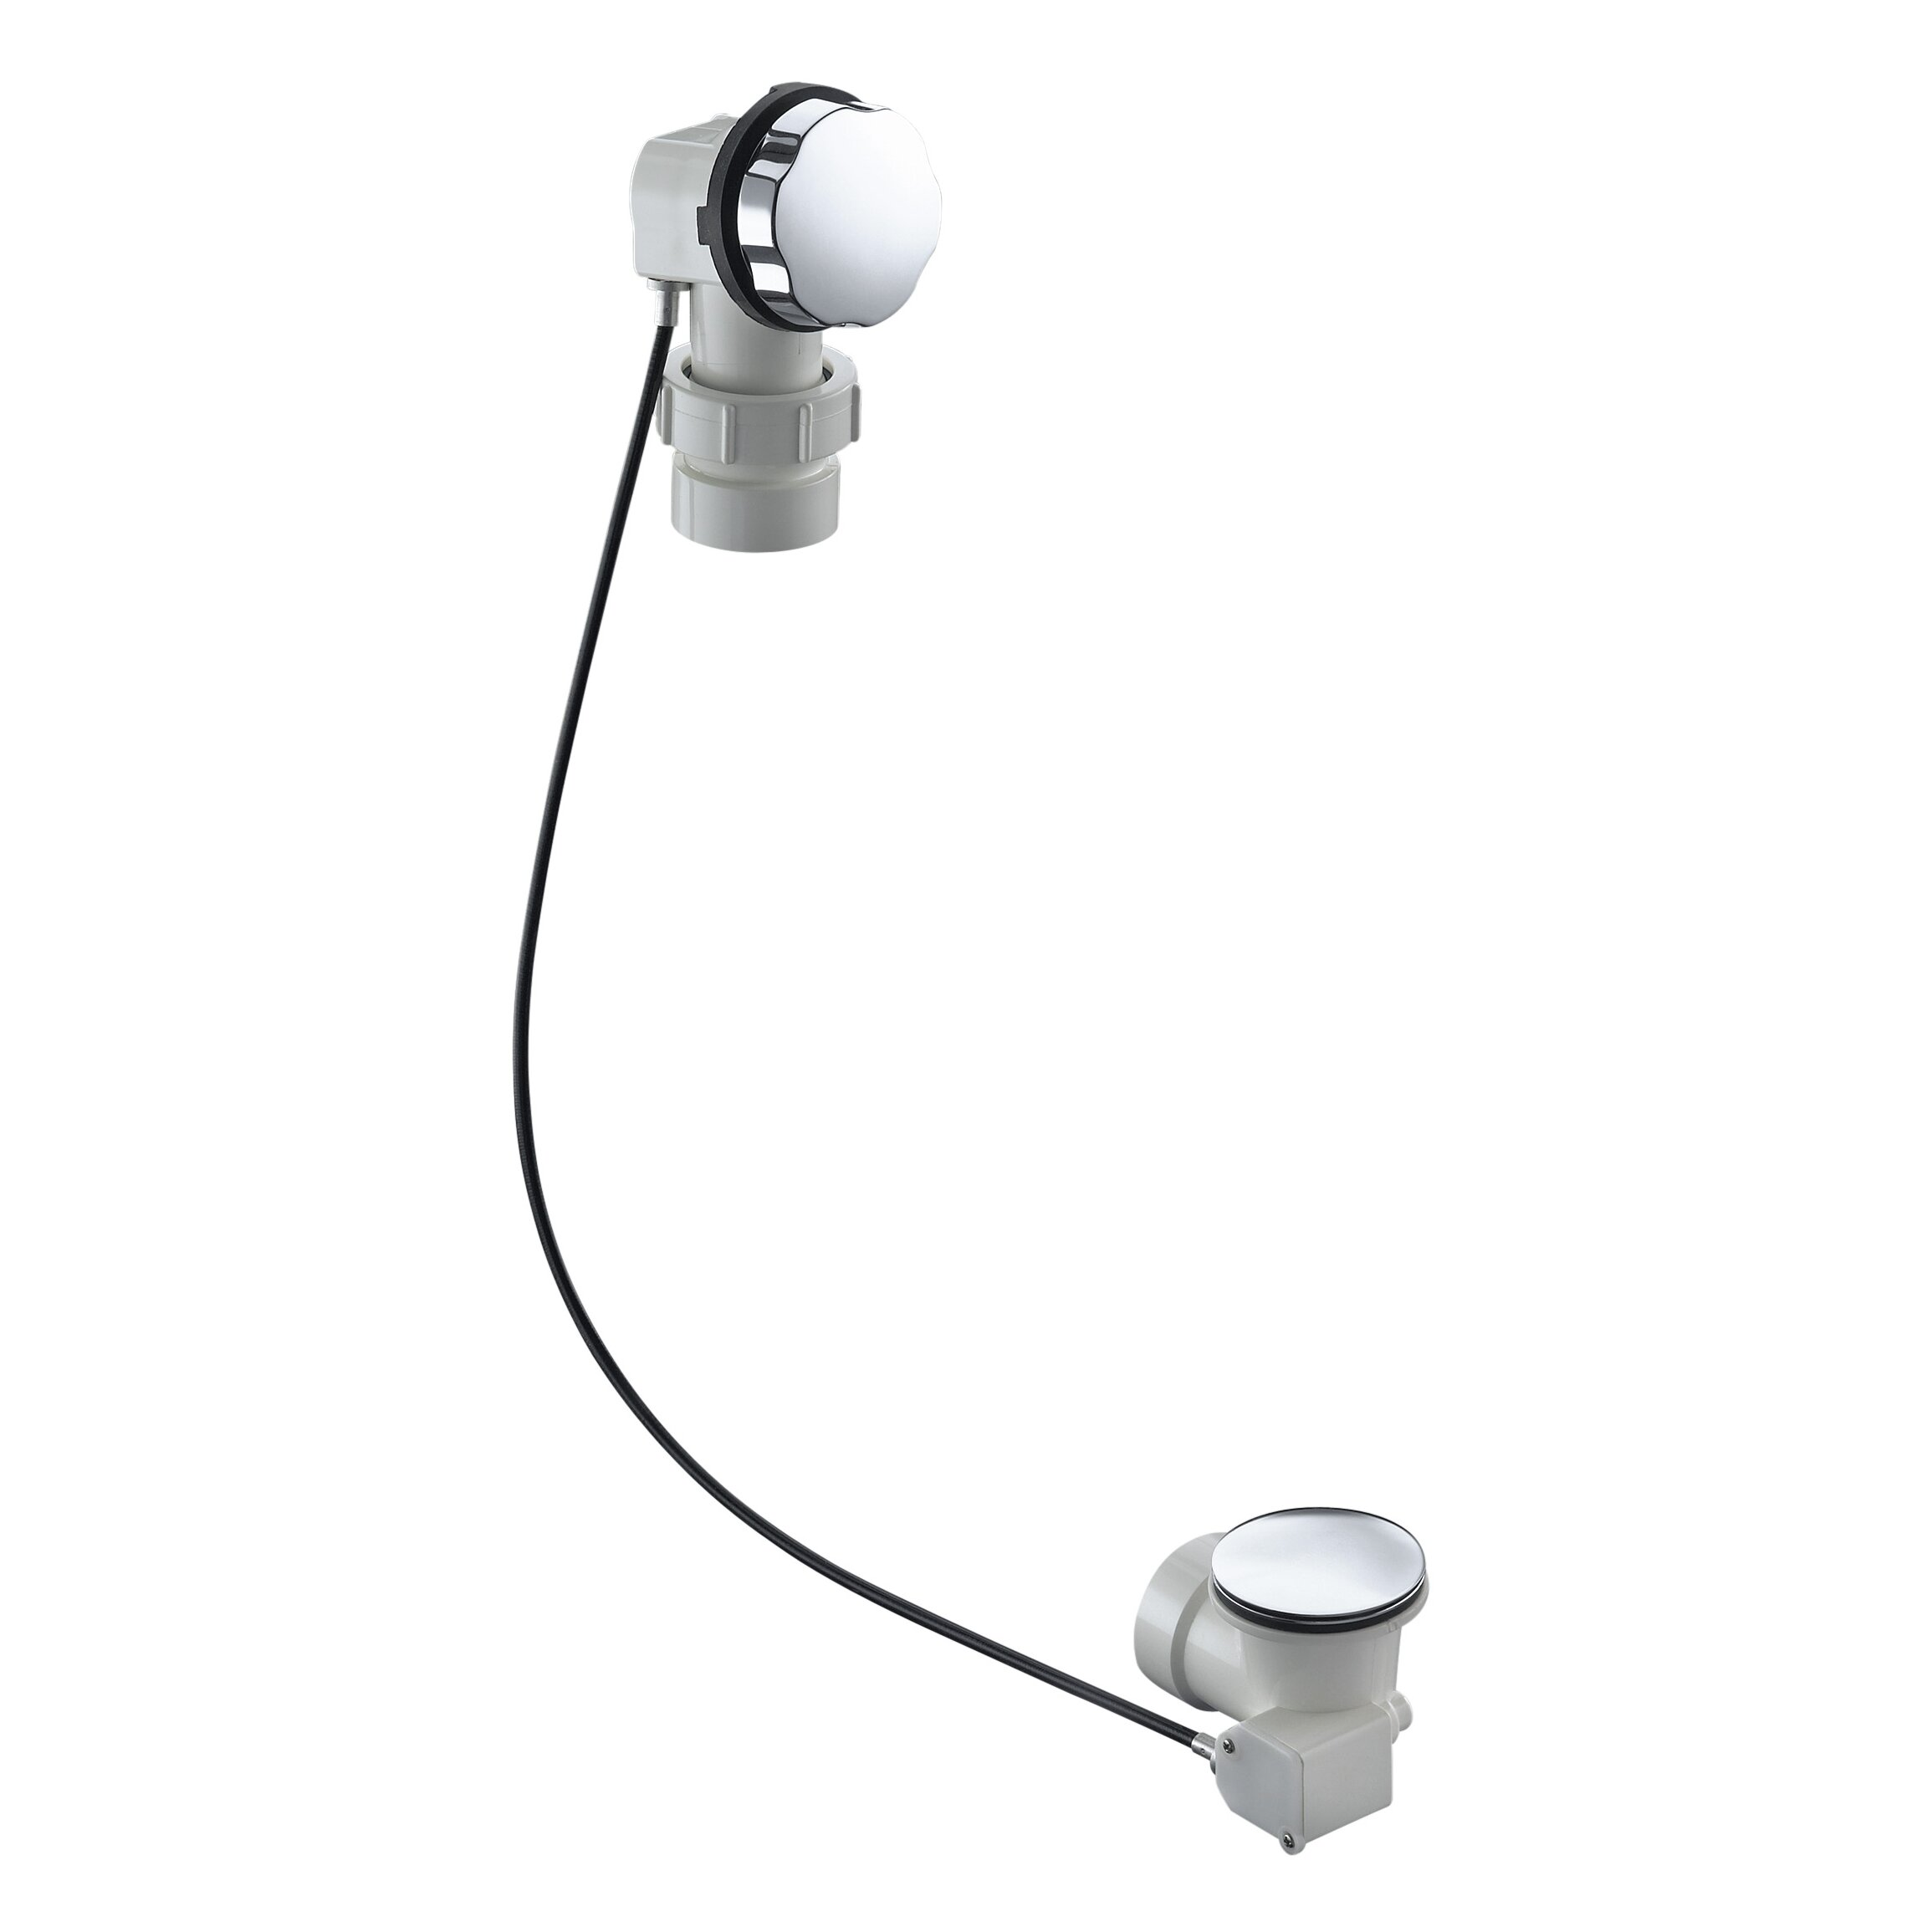 Kohler bathroom sink stopper parts - Kohler Bathtub Drain Stopper Problem Ruki Bathtub Drain Repair Lift And Turn Best Bathtub